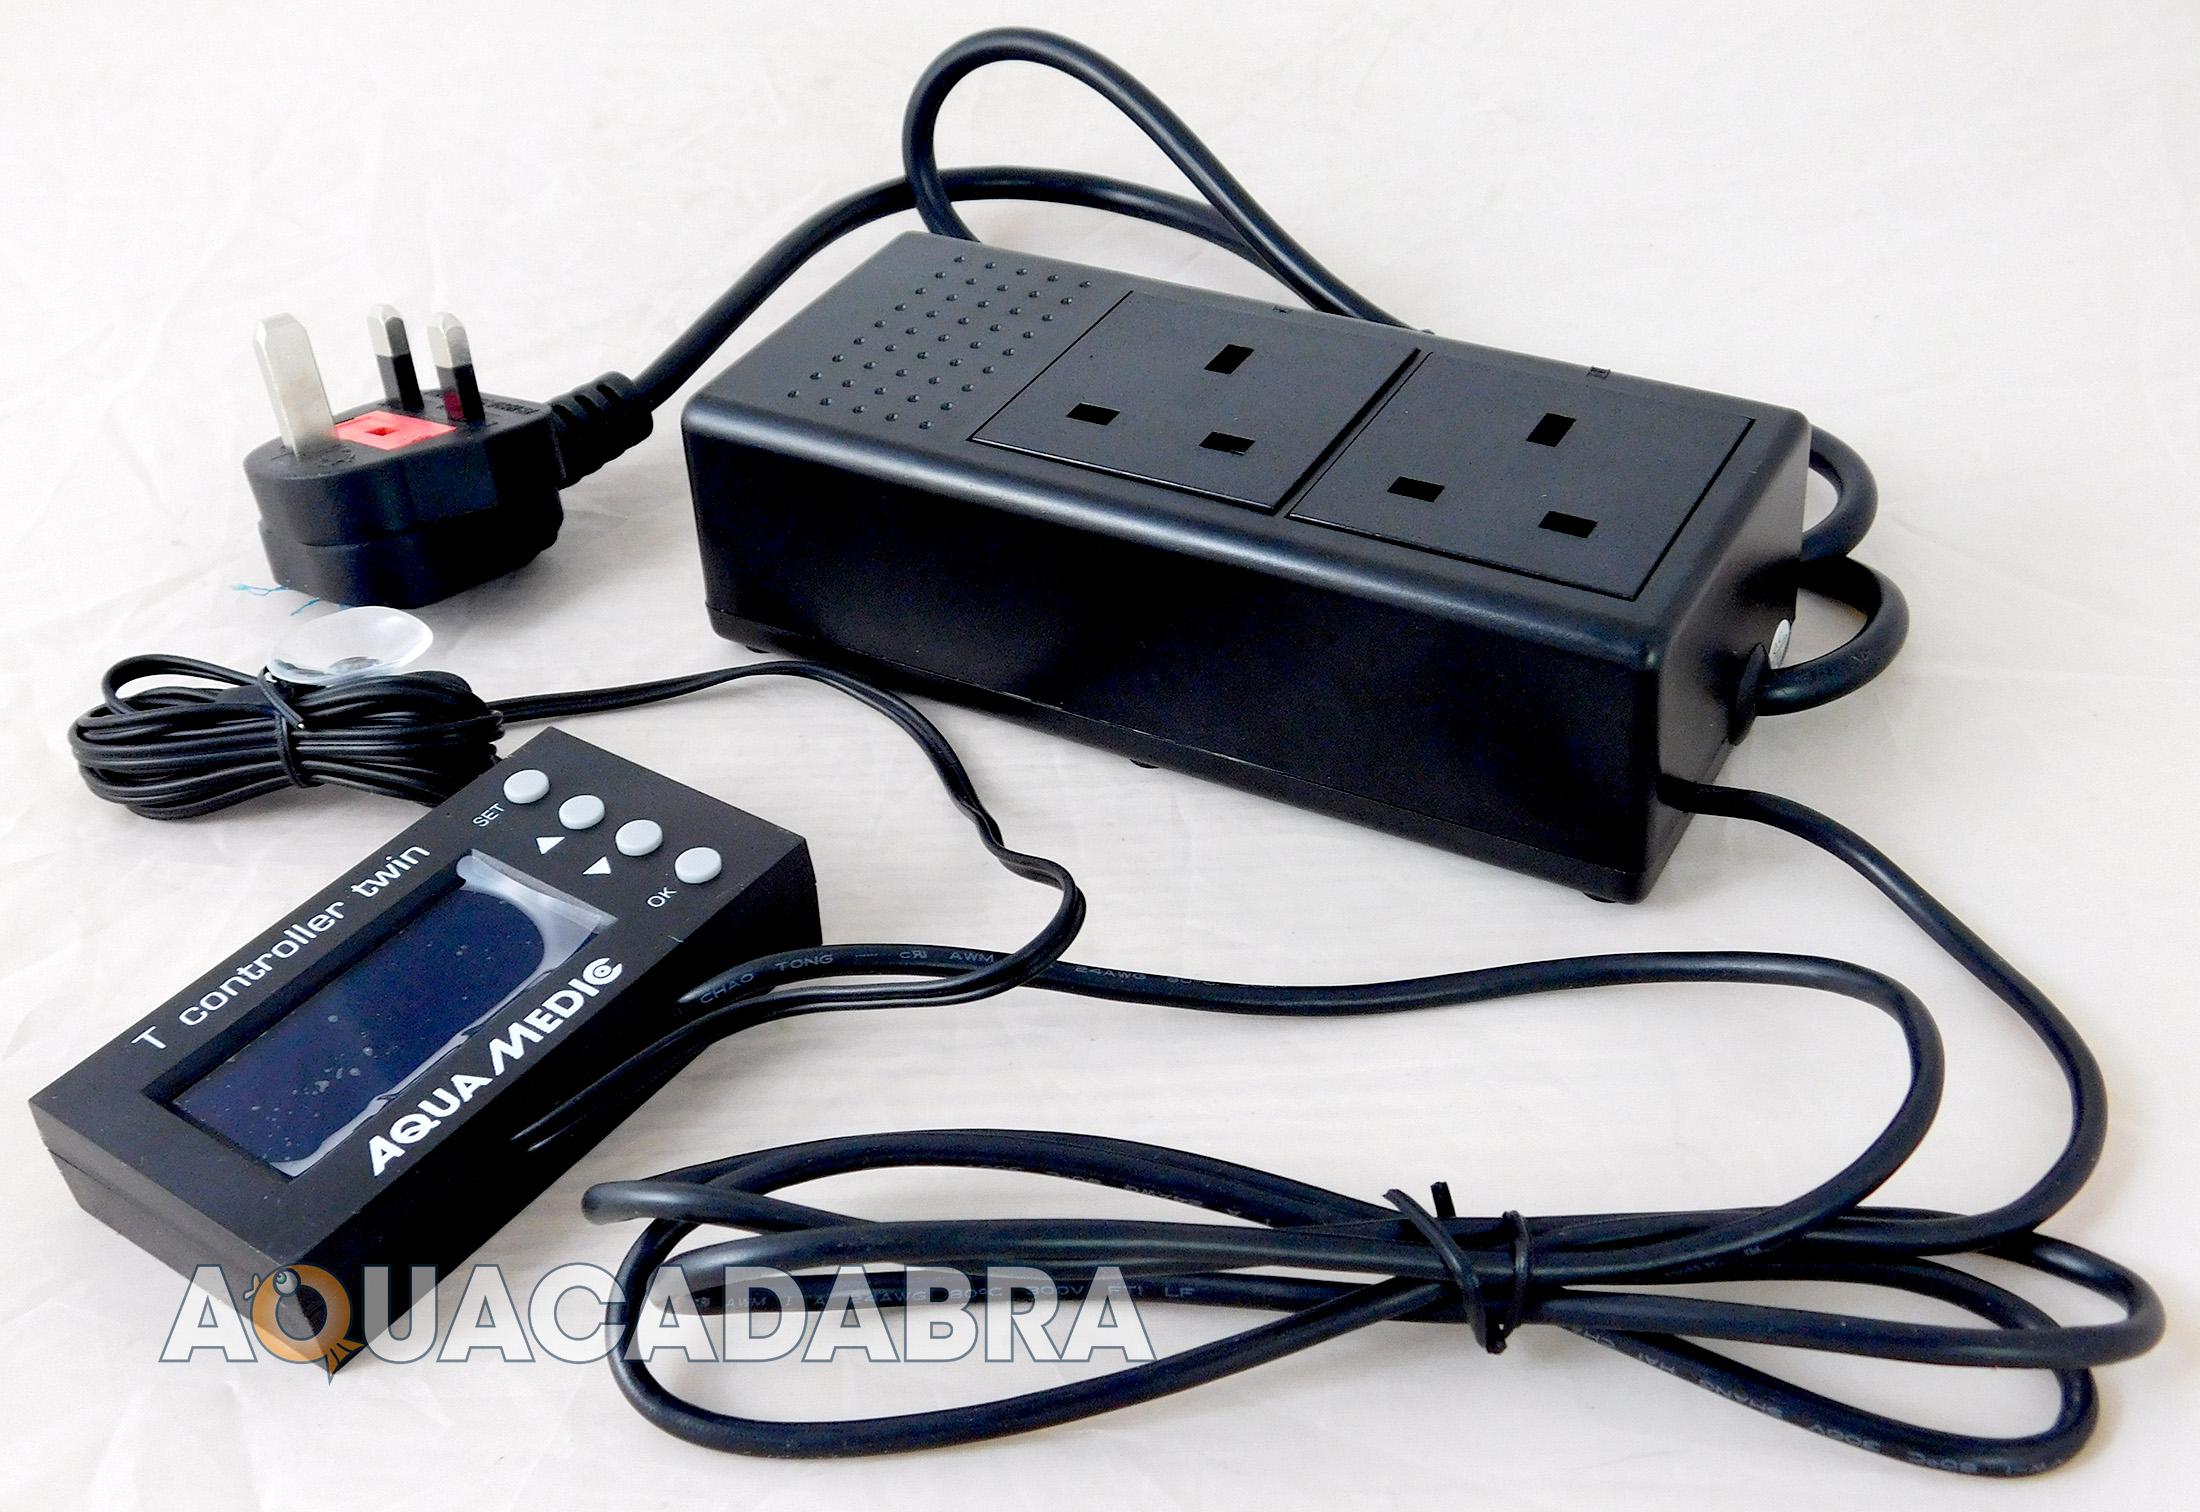 Aqua Medic T Controller Twin Digital Temperature Monitor Heater Cooling Fan Fish